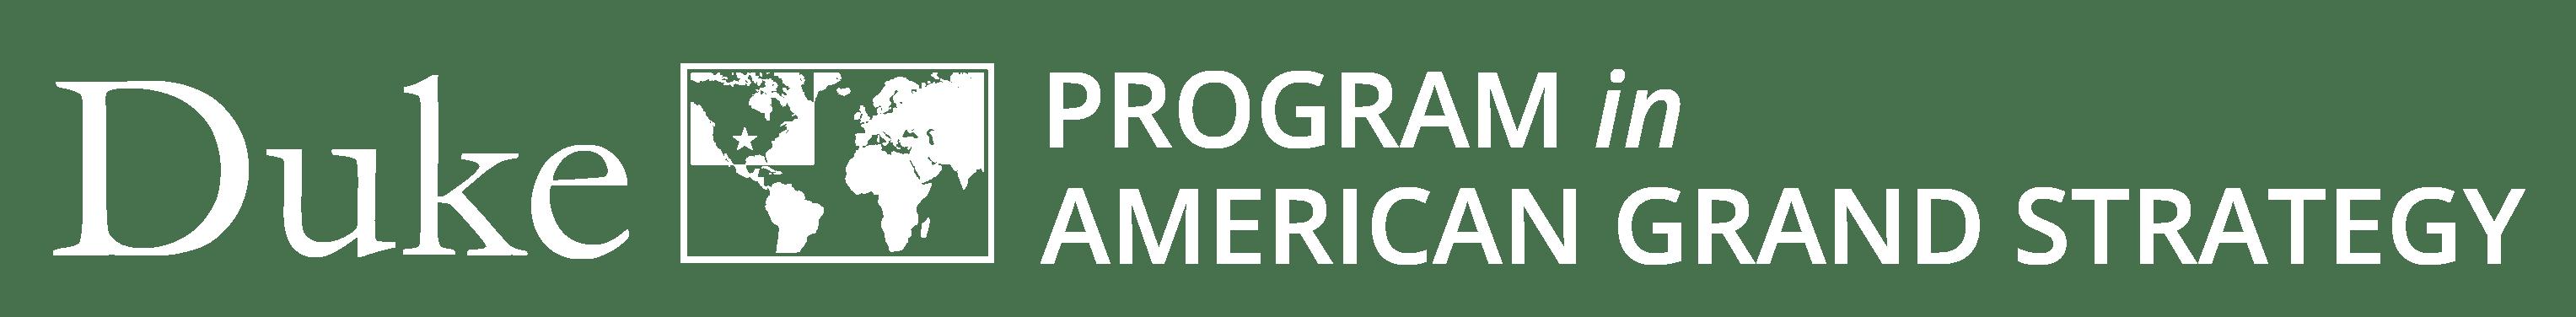 American Grand Strategy